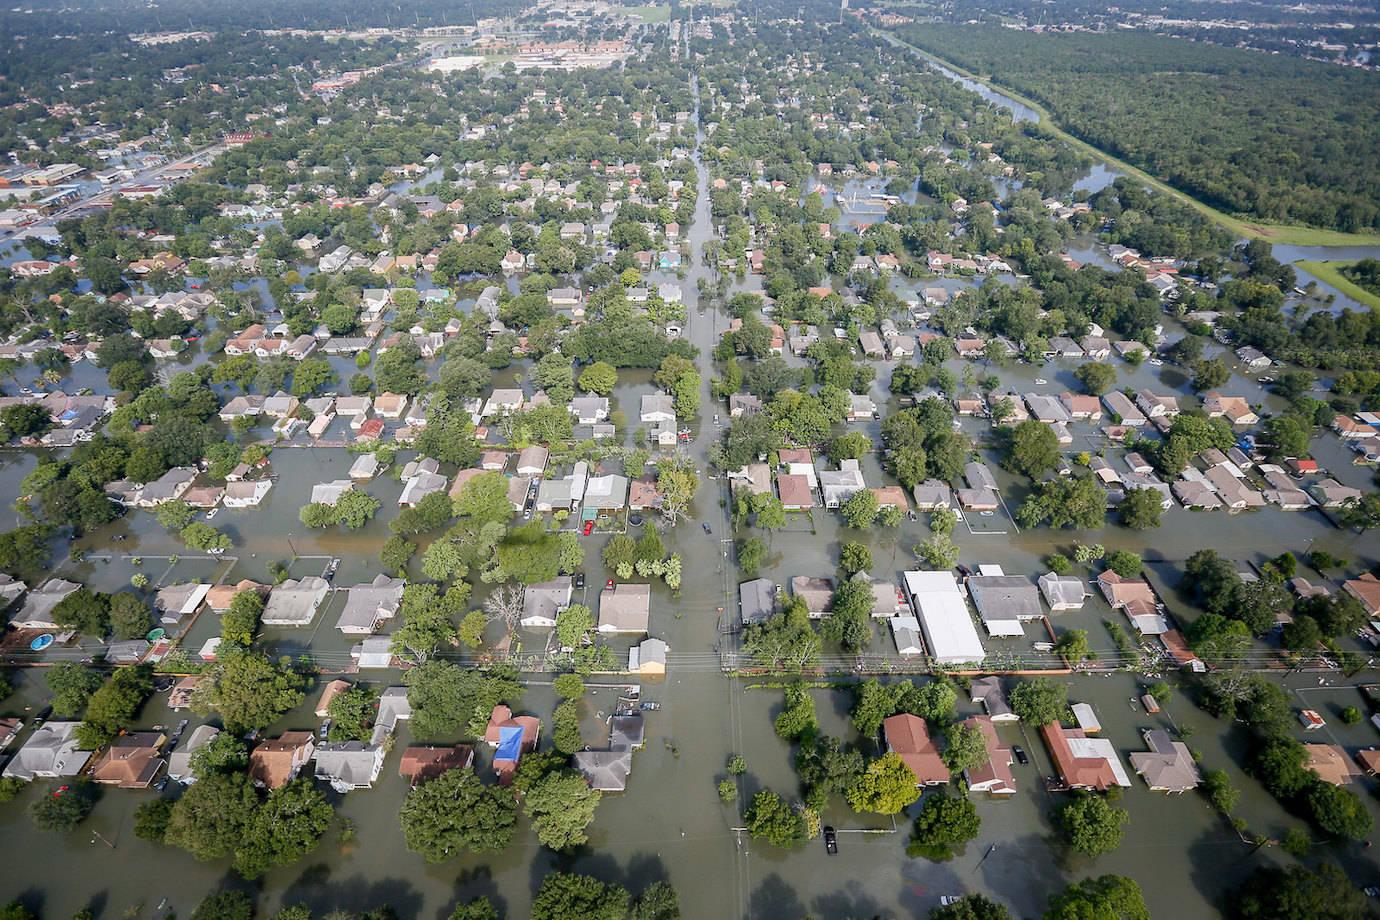 Hurricane Harvey, Tropical Storm Imelda, and Houston Flood Maps